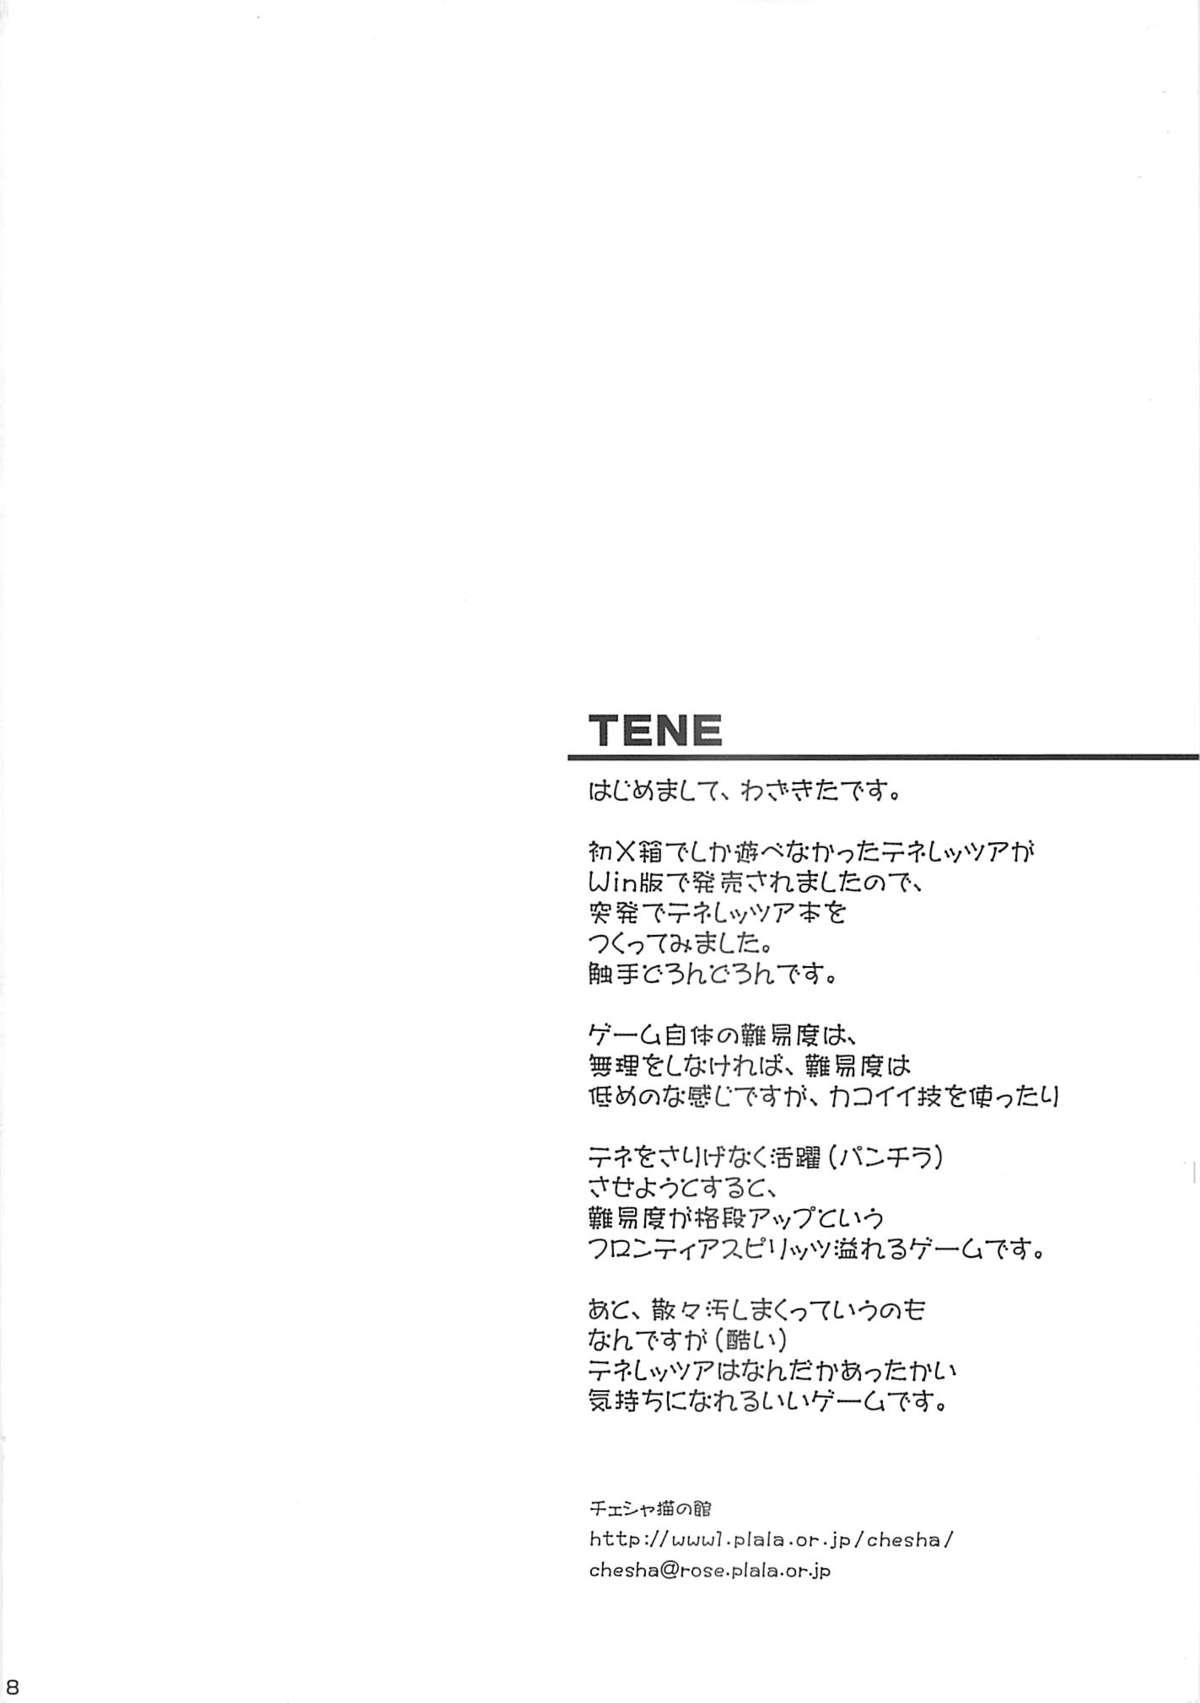 TeNe 17